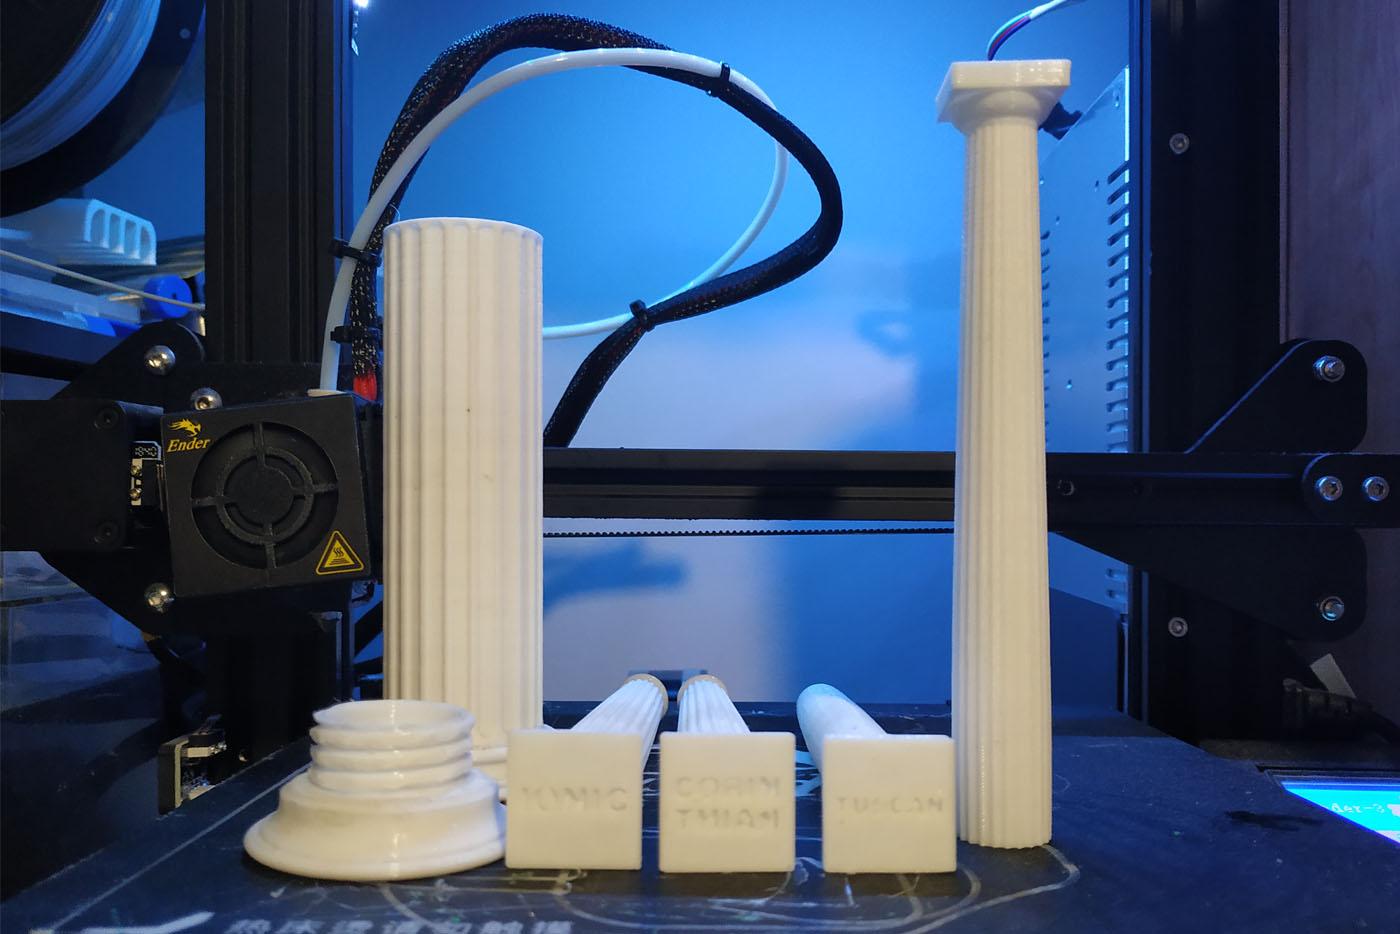 Impresora 3D con columnas clásicas impresas